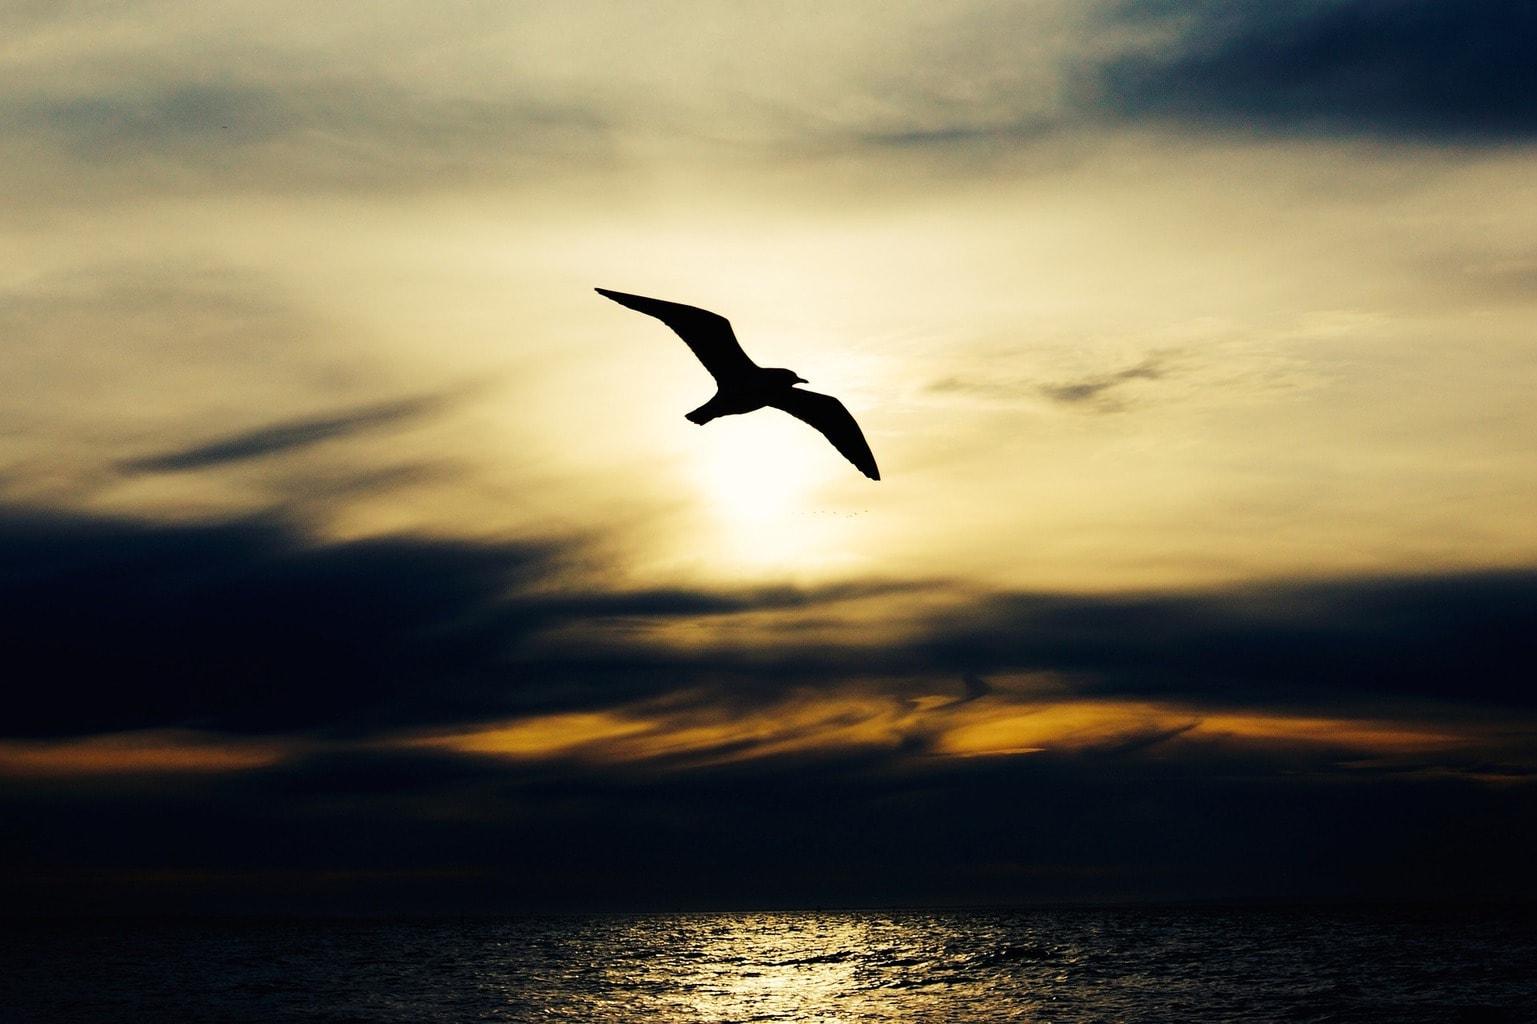 una gabiota volando